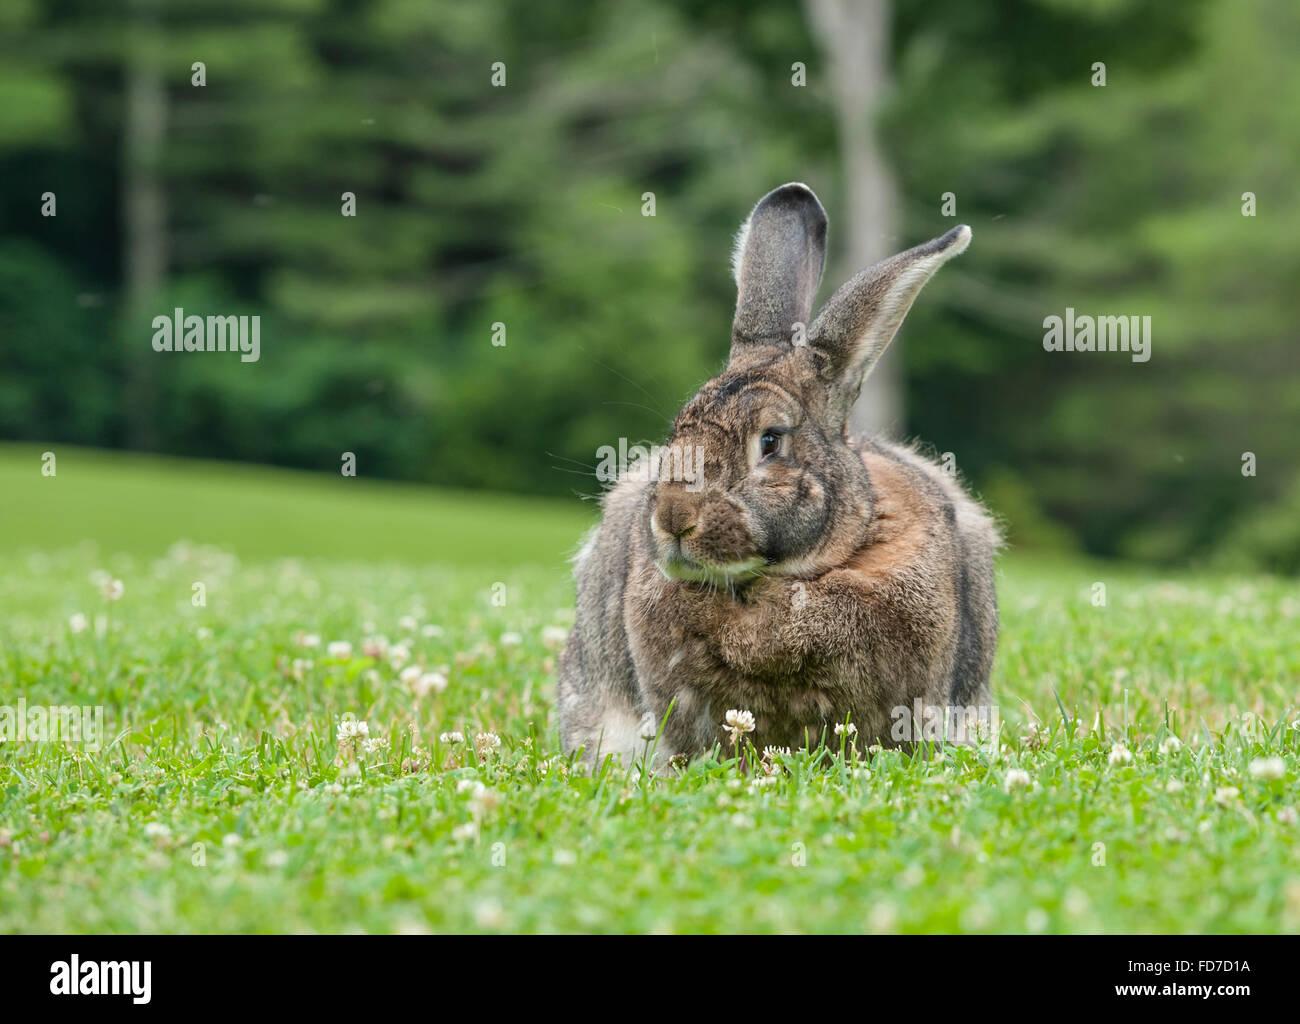 Flemish Giant rabbit on grass lawn - Stock Image